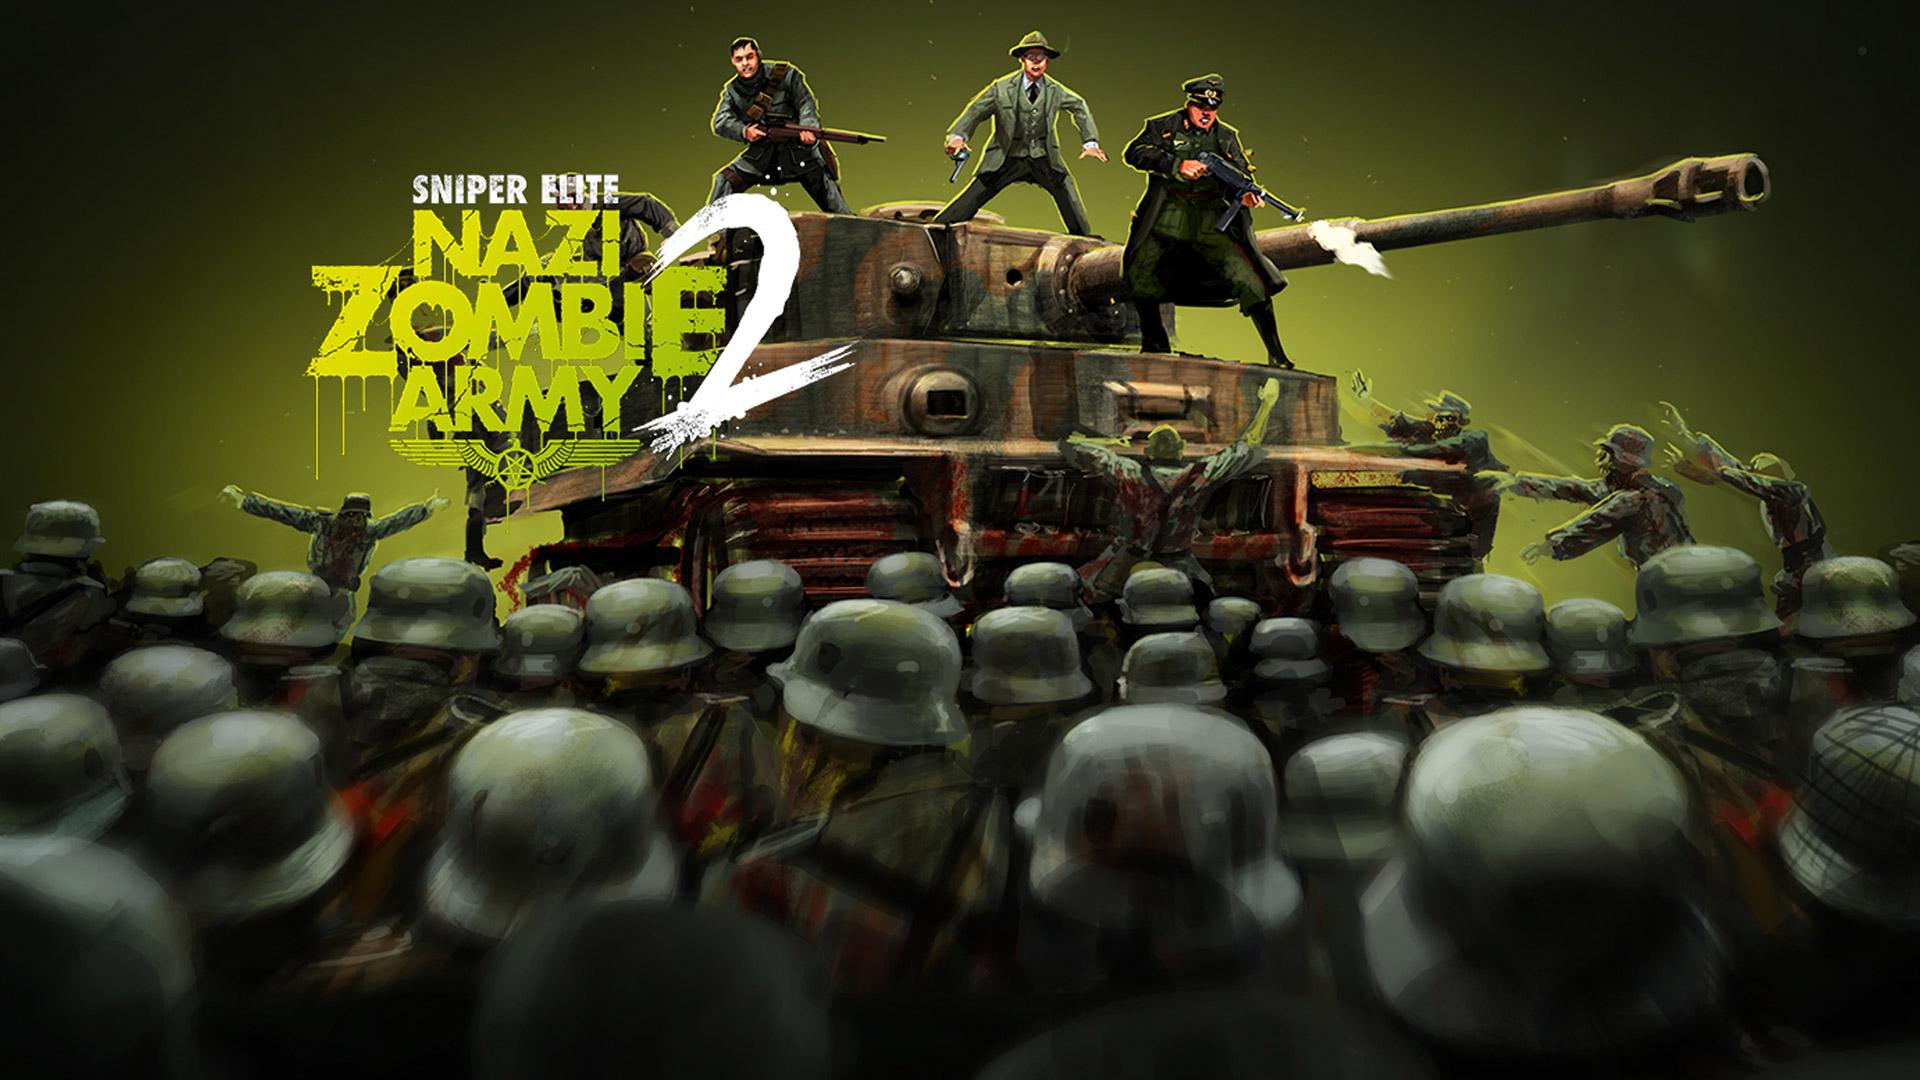 Free Sniper Elite: Nazi Zombie Army 2 Wallpaper in 1920x1080